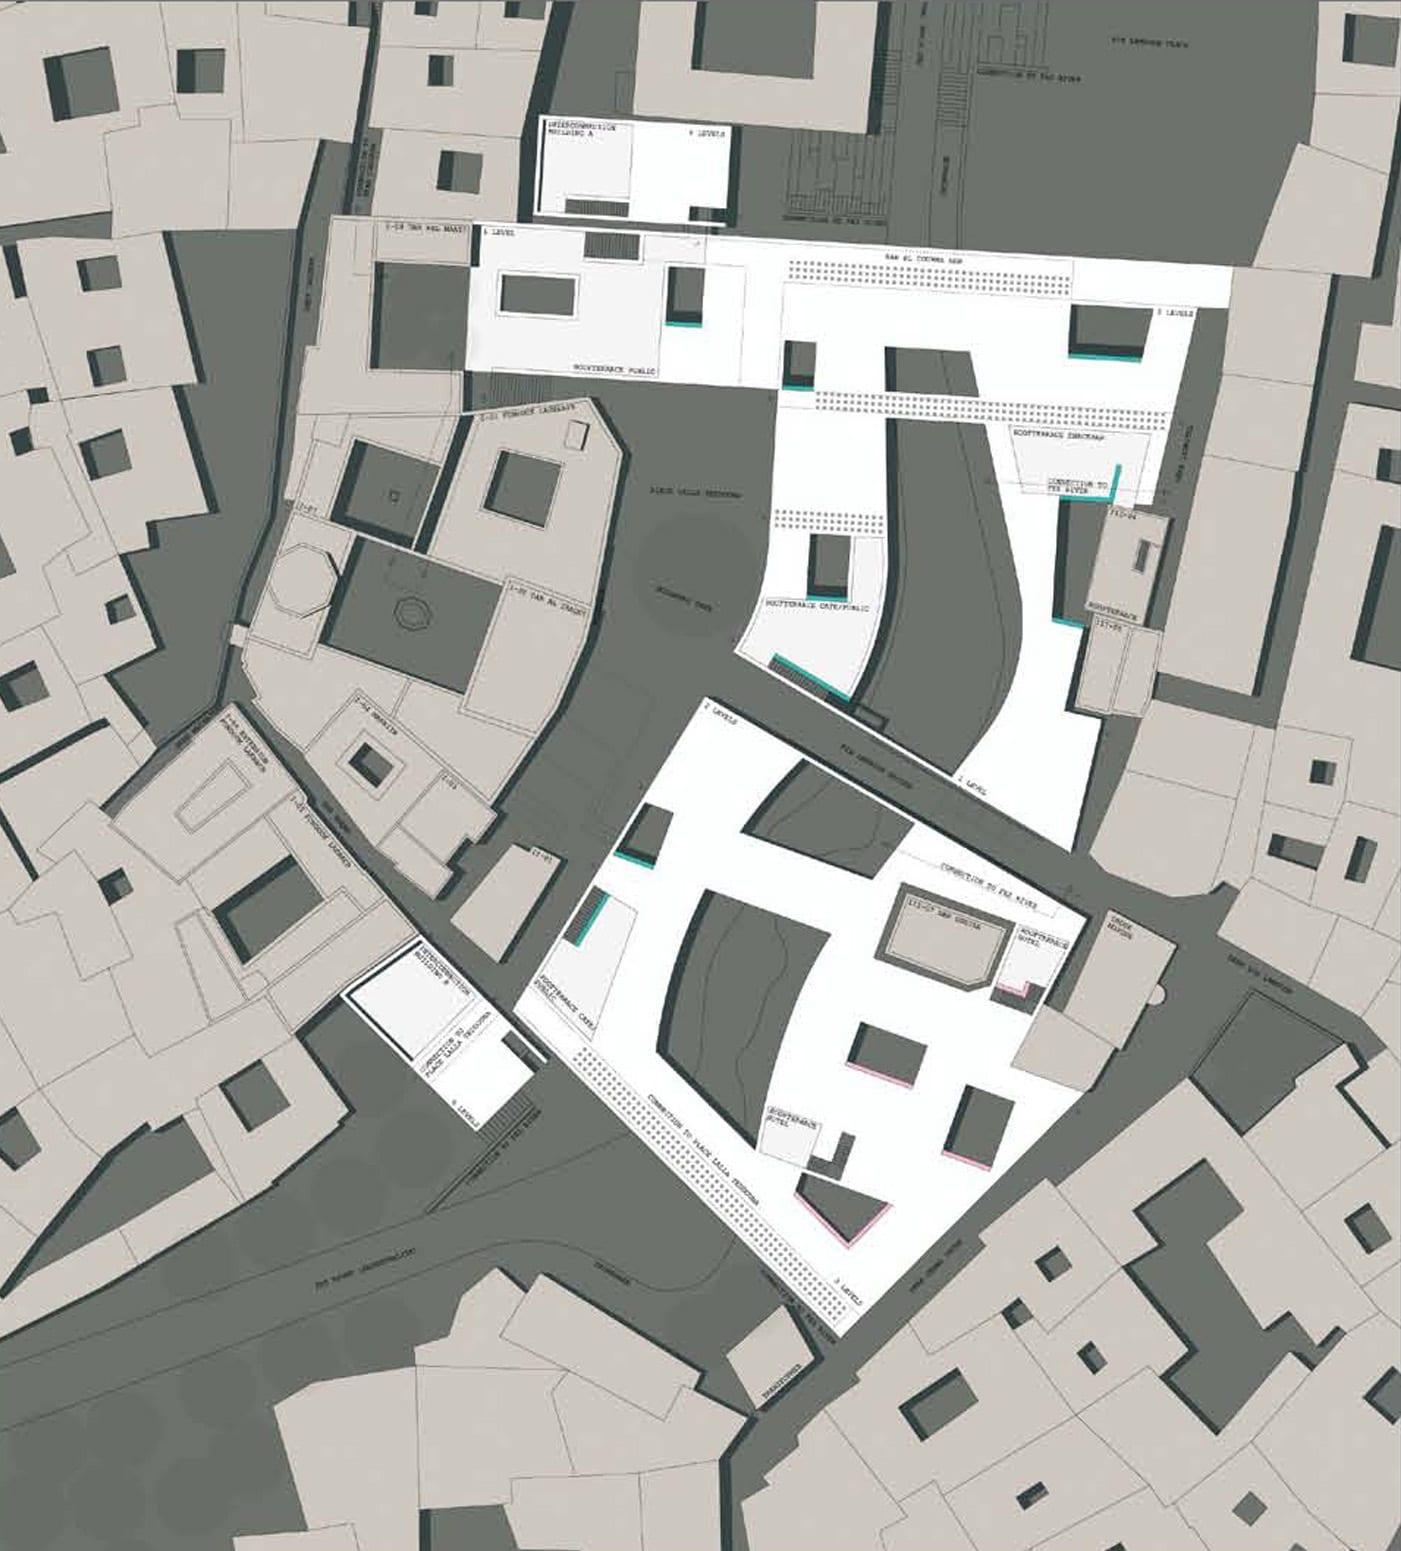 fes_site_plan_5006_kolb_hader_architekten_kubik_studio